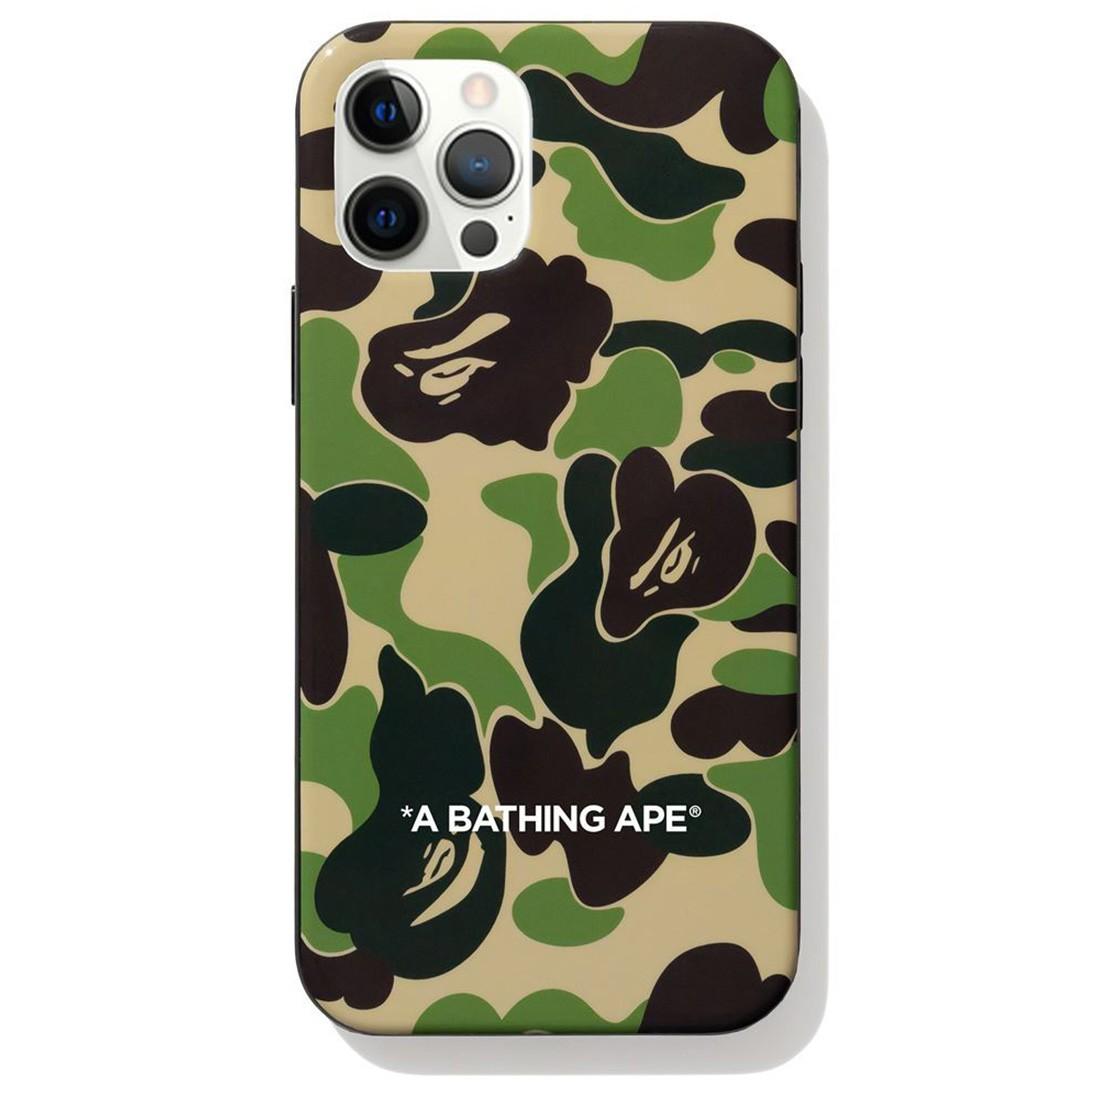 A Bathing Ape ABC Camo iPhone 12 / 12 Pro Case (green)